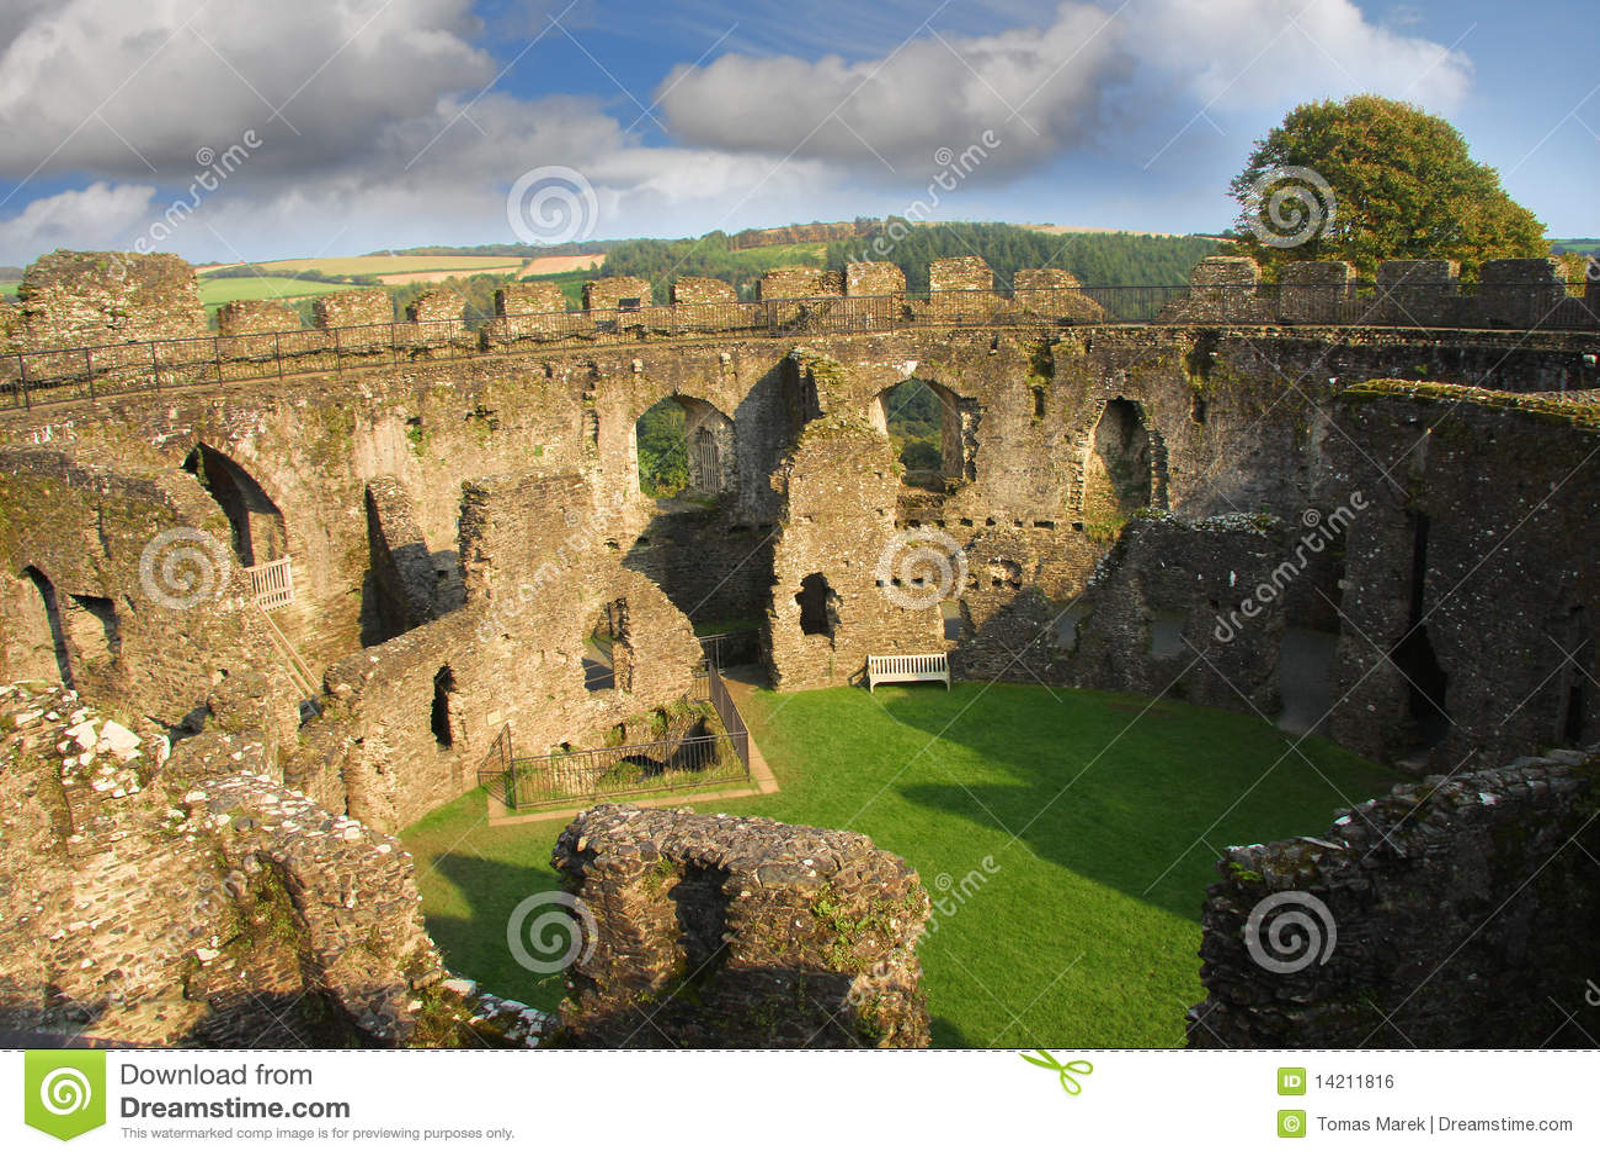 Restormel Castle, Lostwithiel Cornwall England